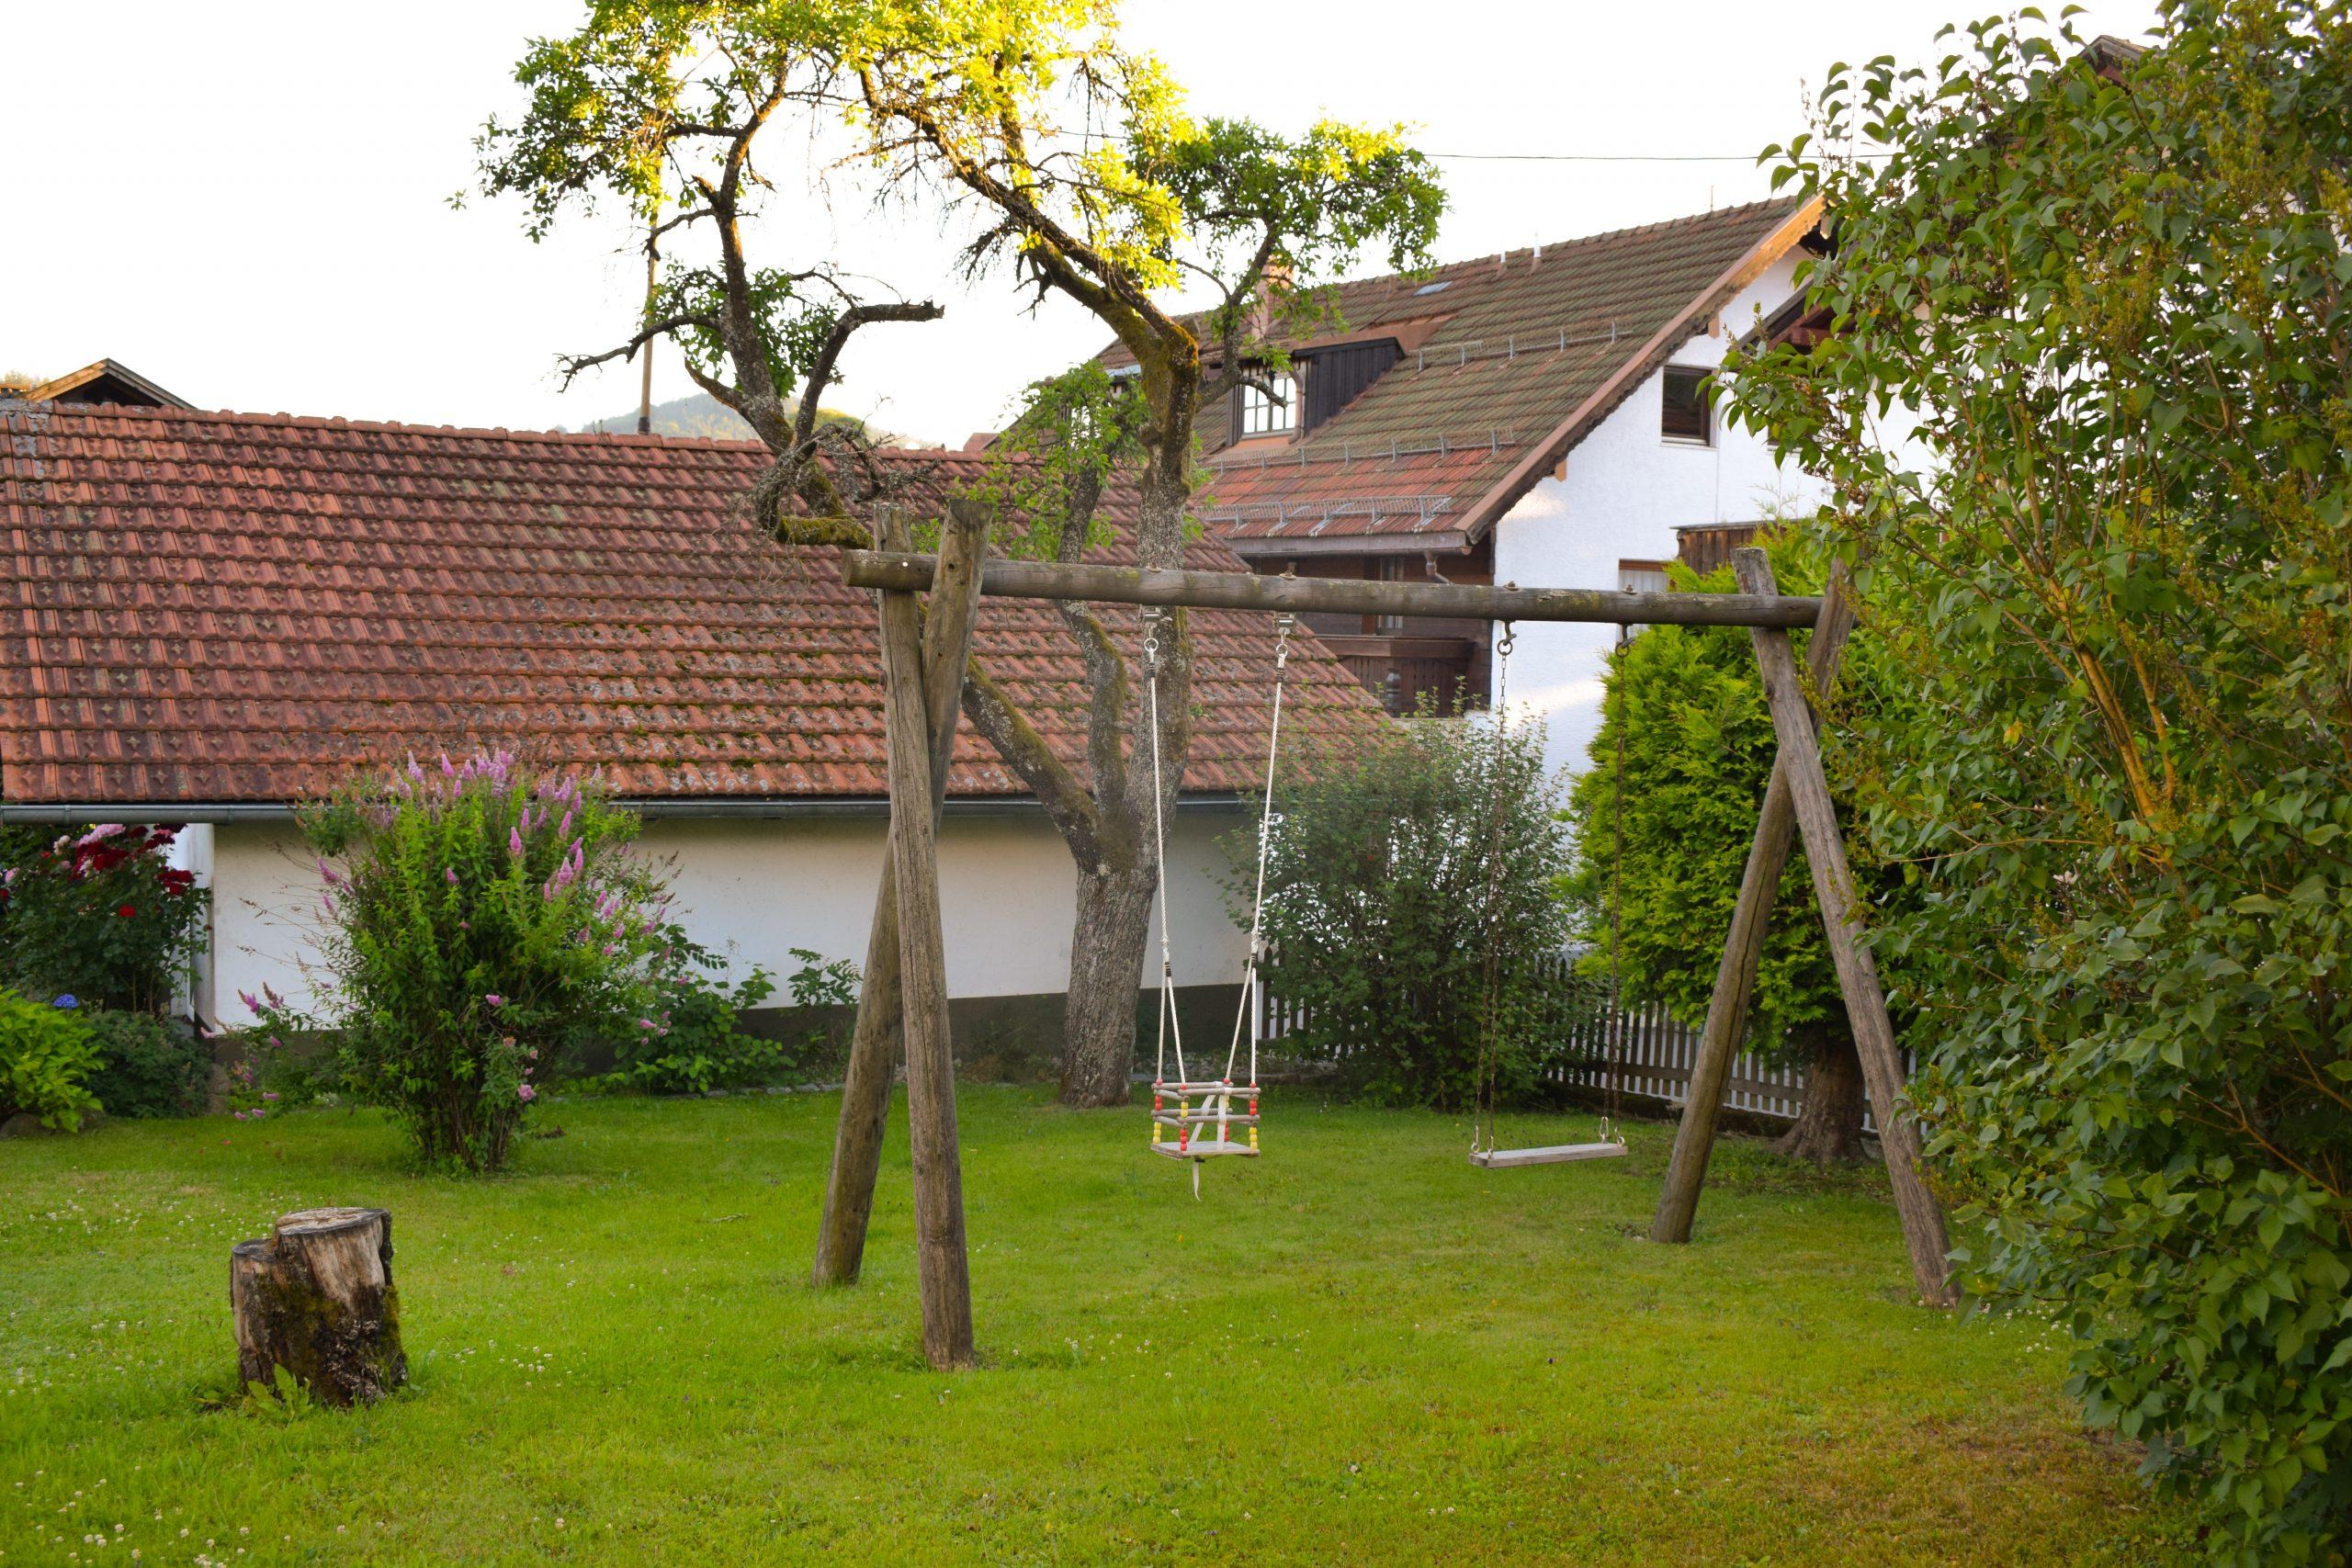 Full Size of Gartenschaukel Erwachsene Schaukel Garten Baby Ohne Betonieren Holz Gartenliege Wohnzimmer Gartenschaukel Erwachsene